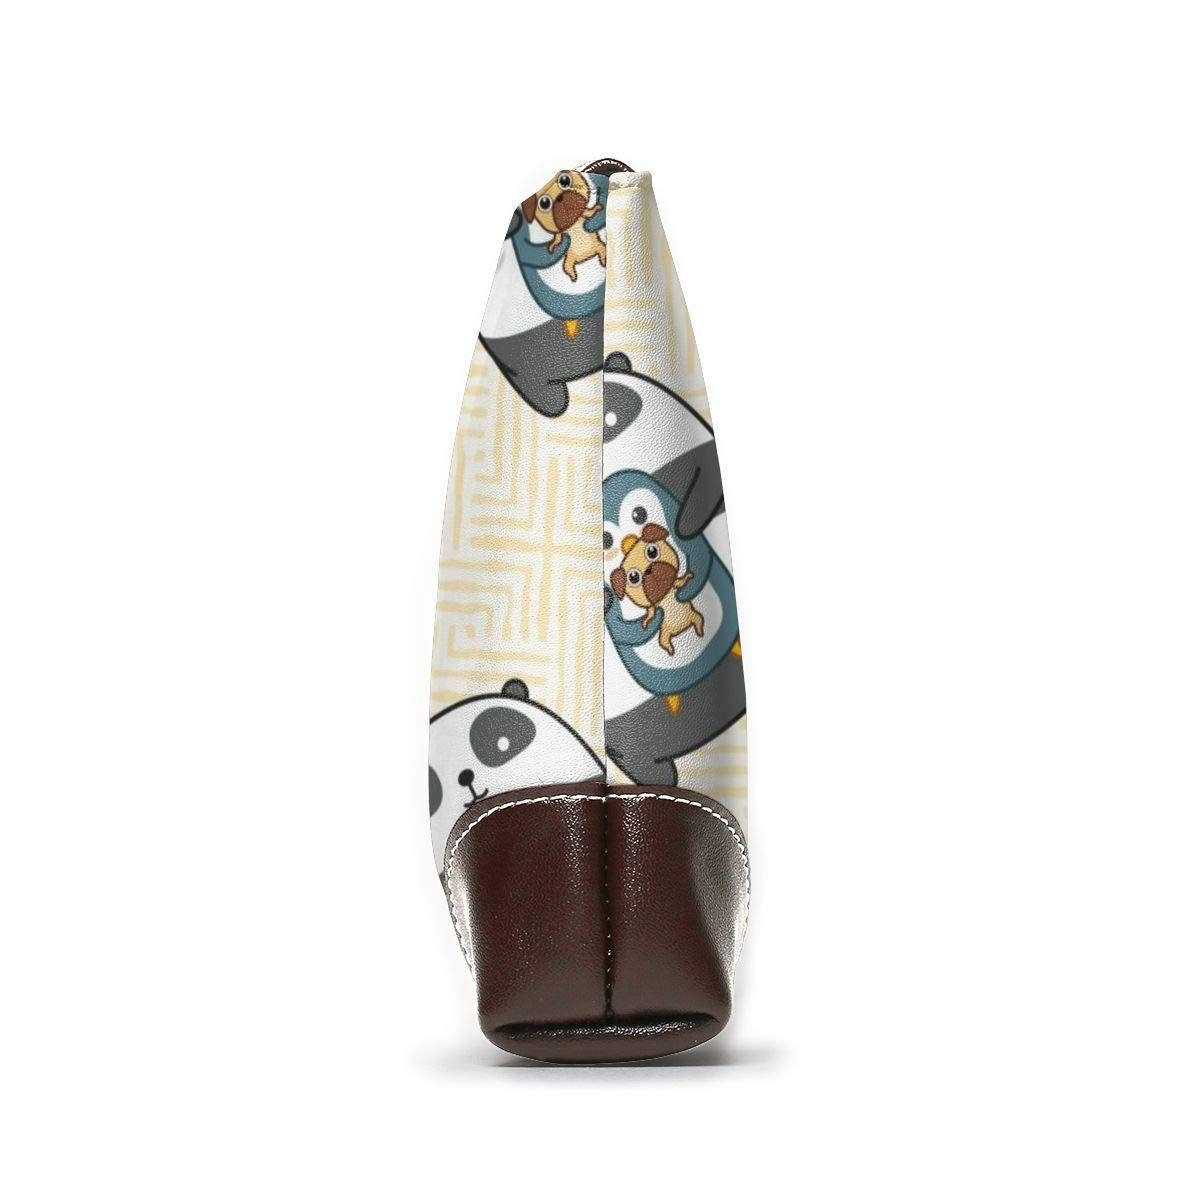 Panda Penguin Dog Pattern Leather Wristlet Clutch Purses Bag Crossbody Clutch Wallet Handbags For Women